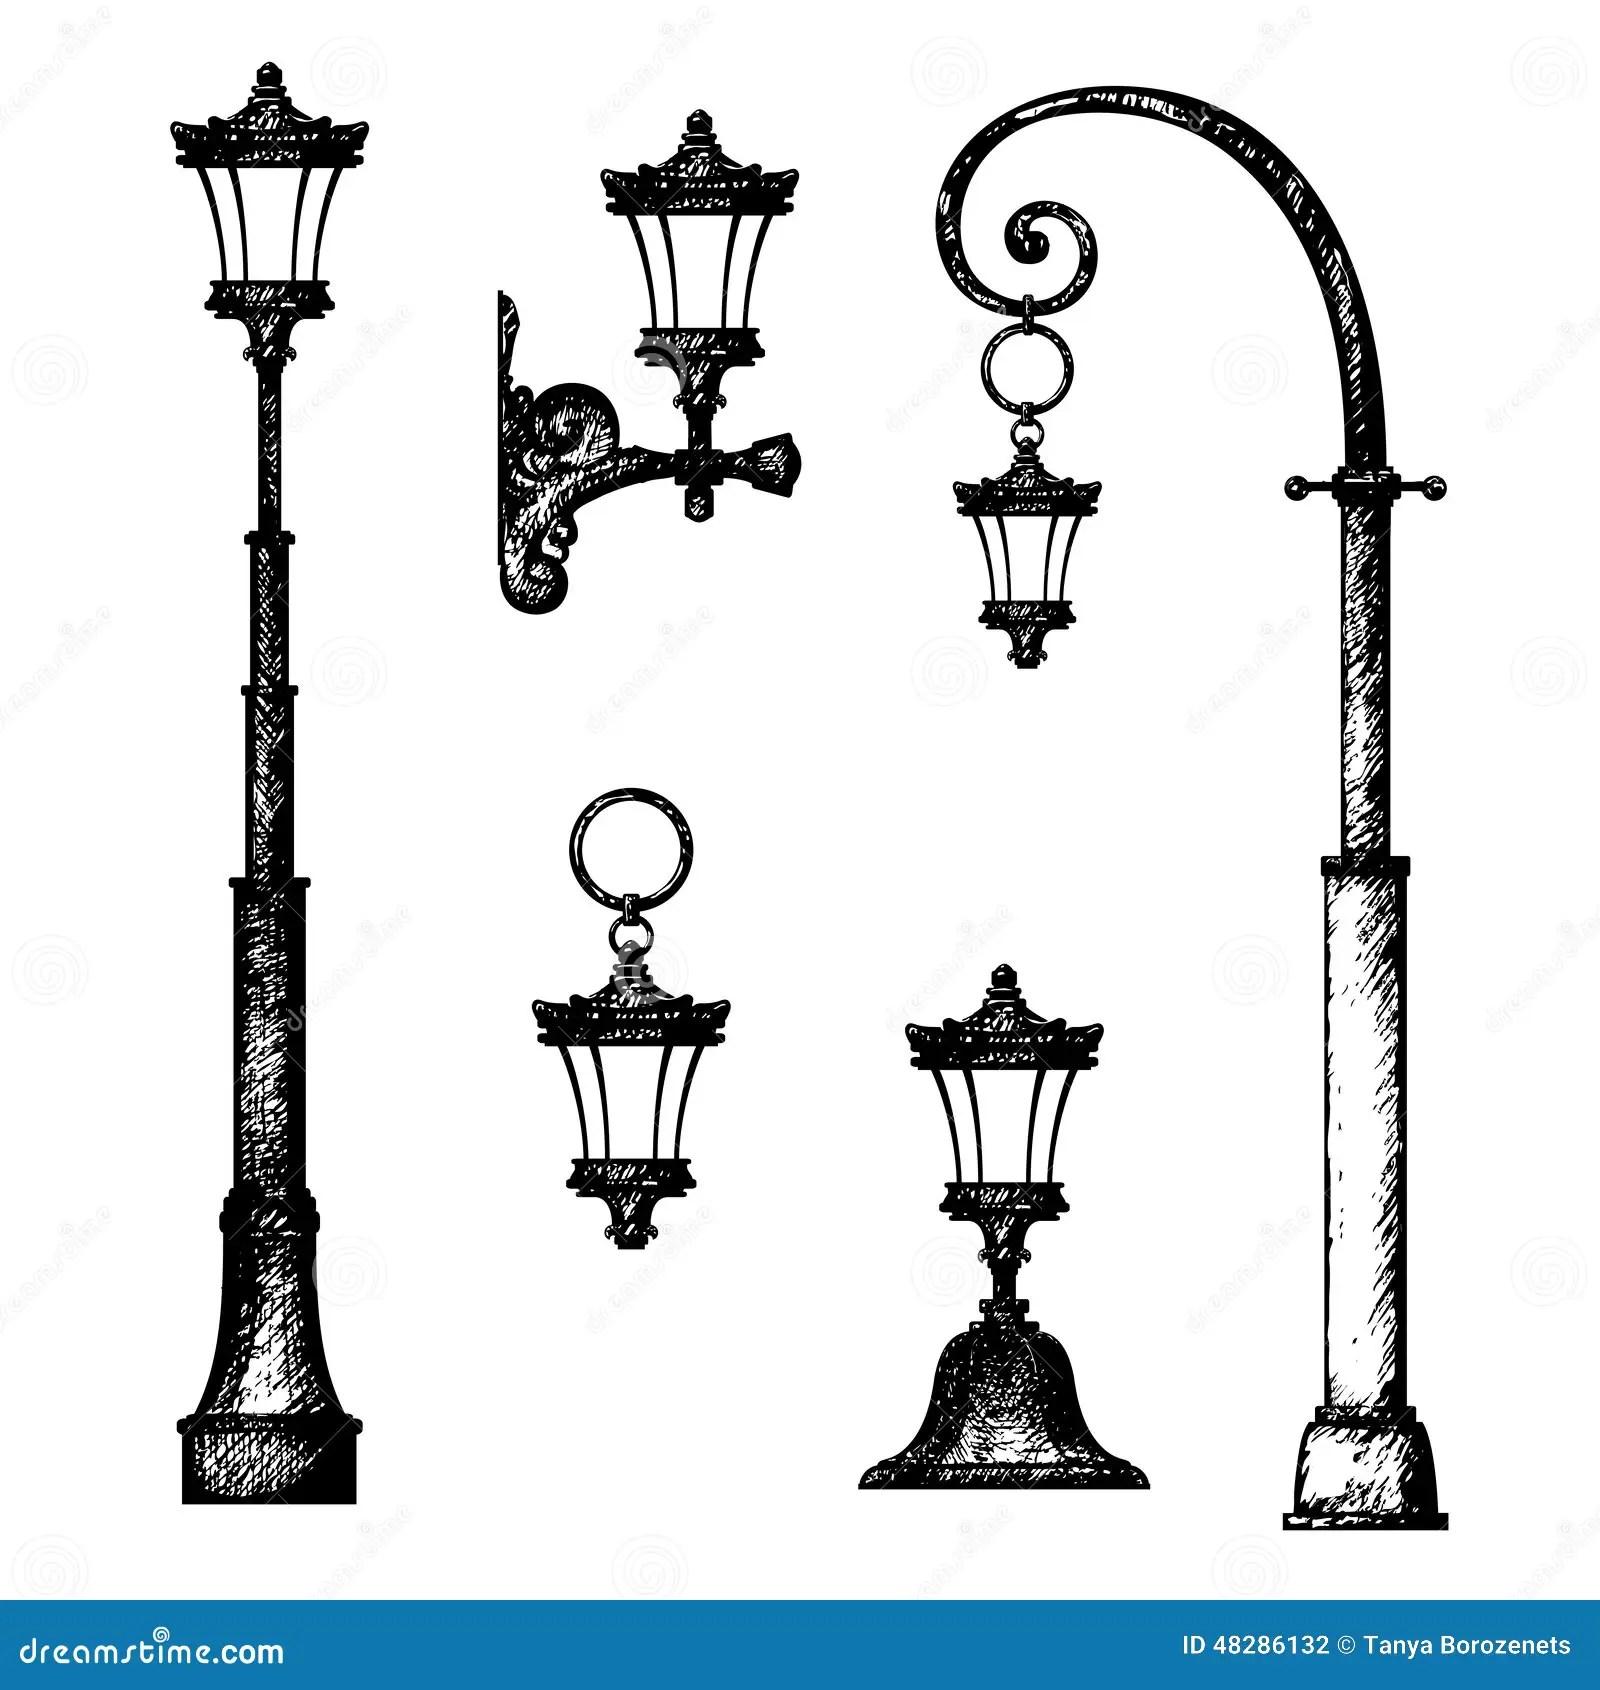 Pole Street Light Installation